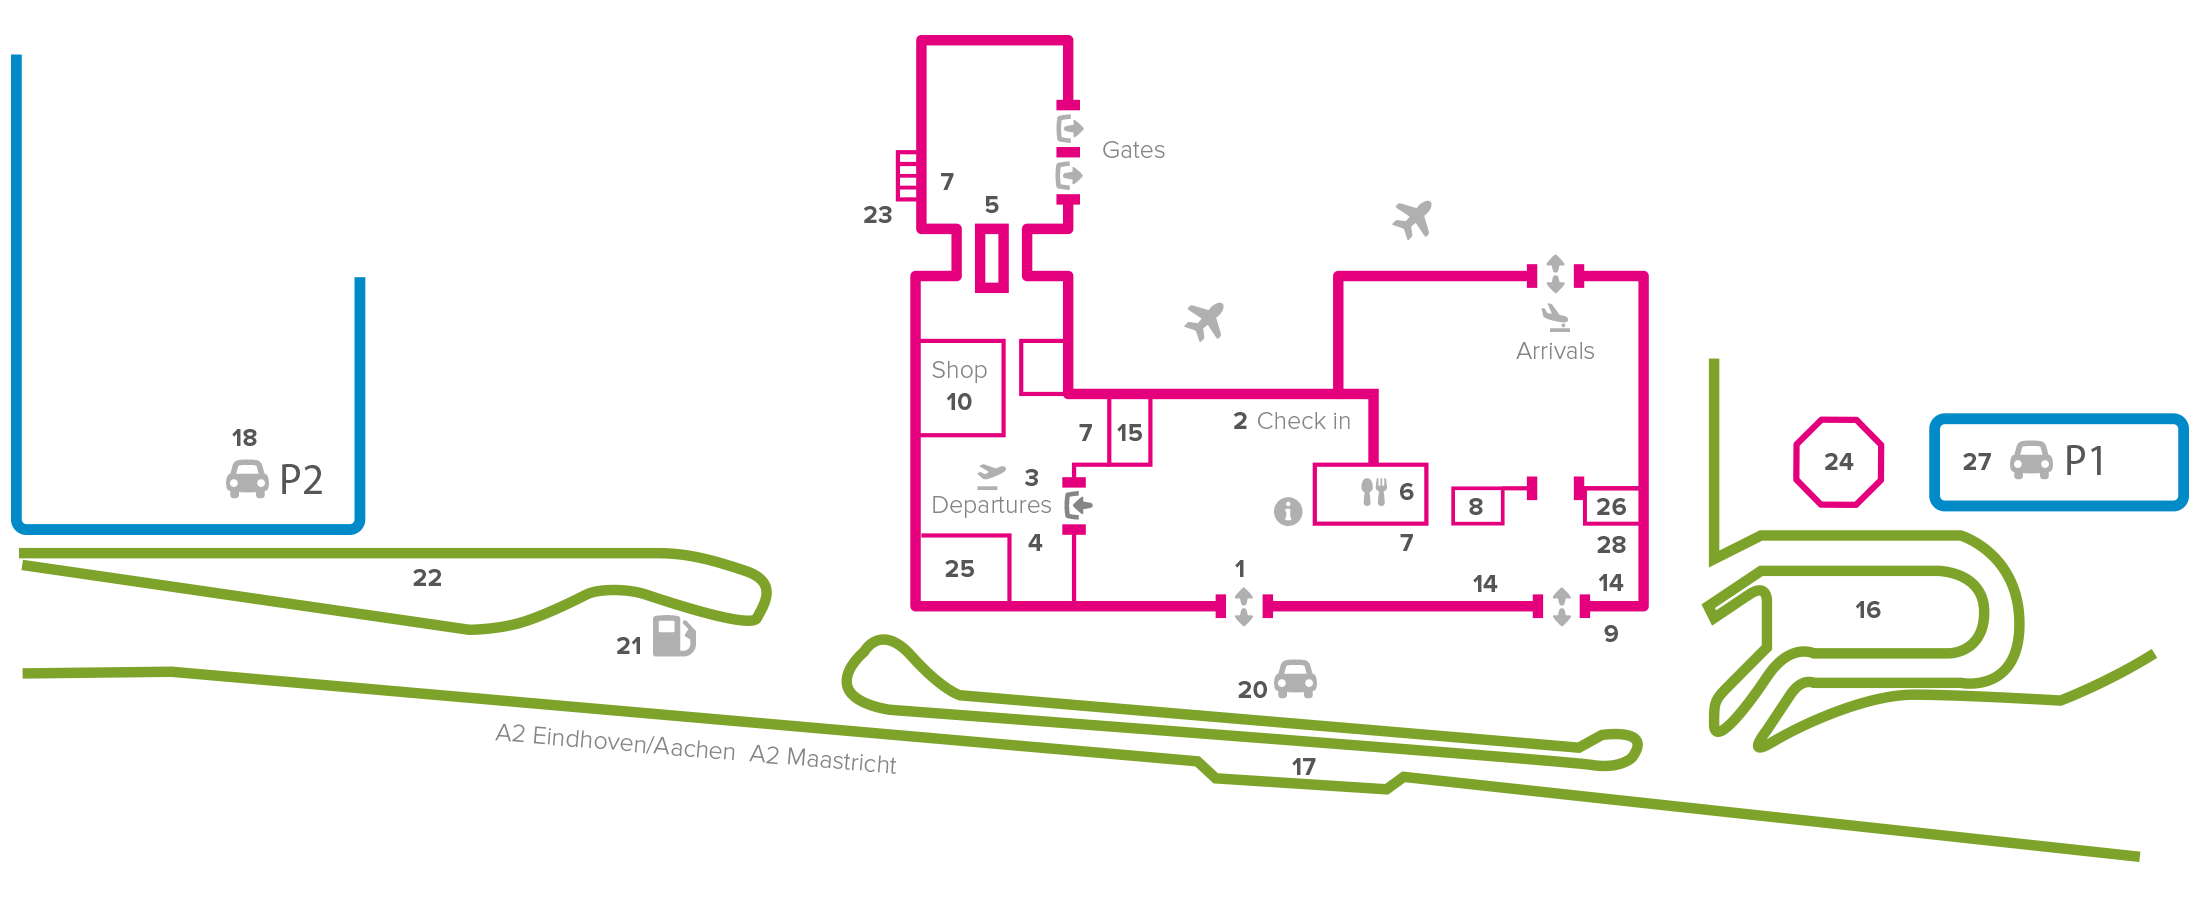 Maastricht Airport